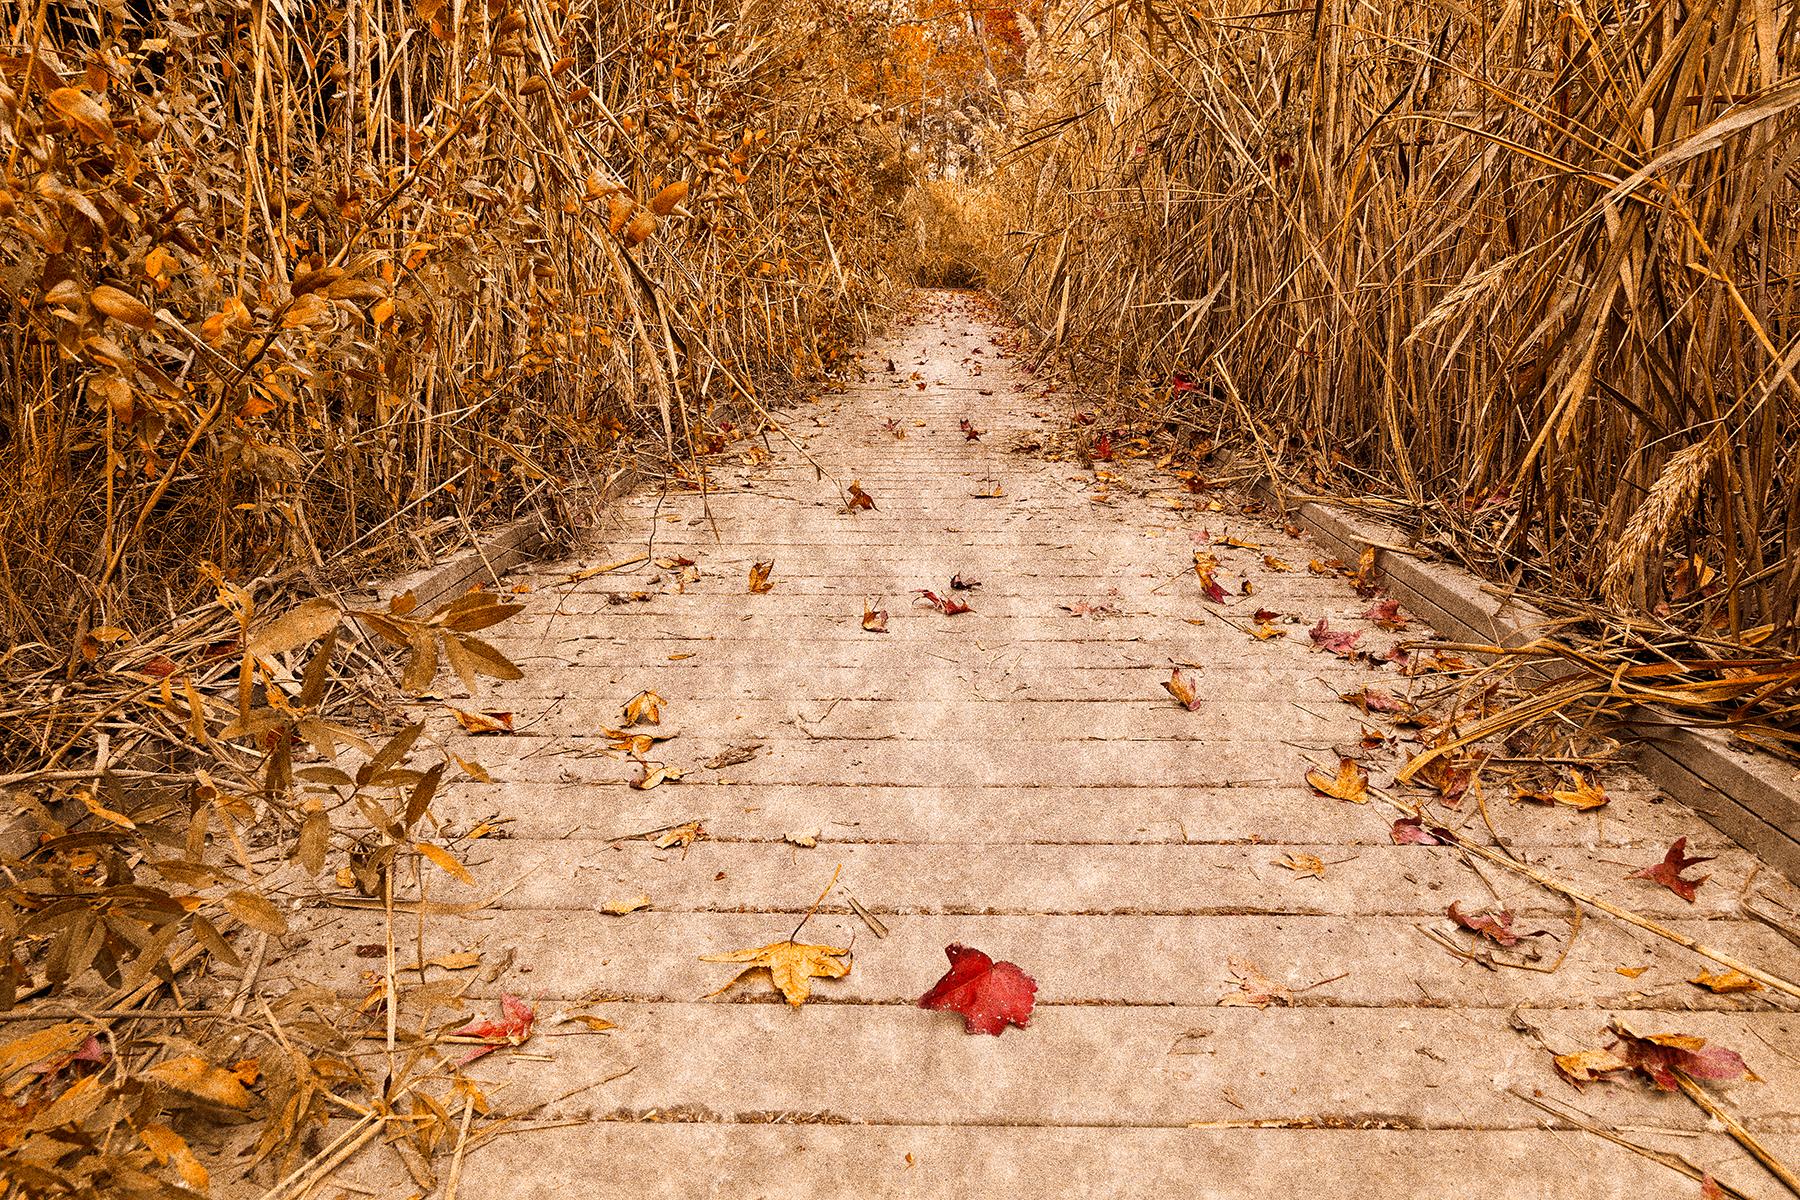 Rustic Marsh Boardwalk, Age, Surreal, States, Smyrna, HQ Photo